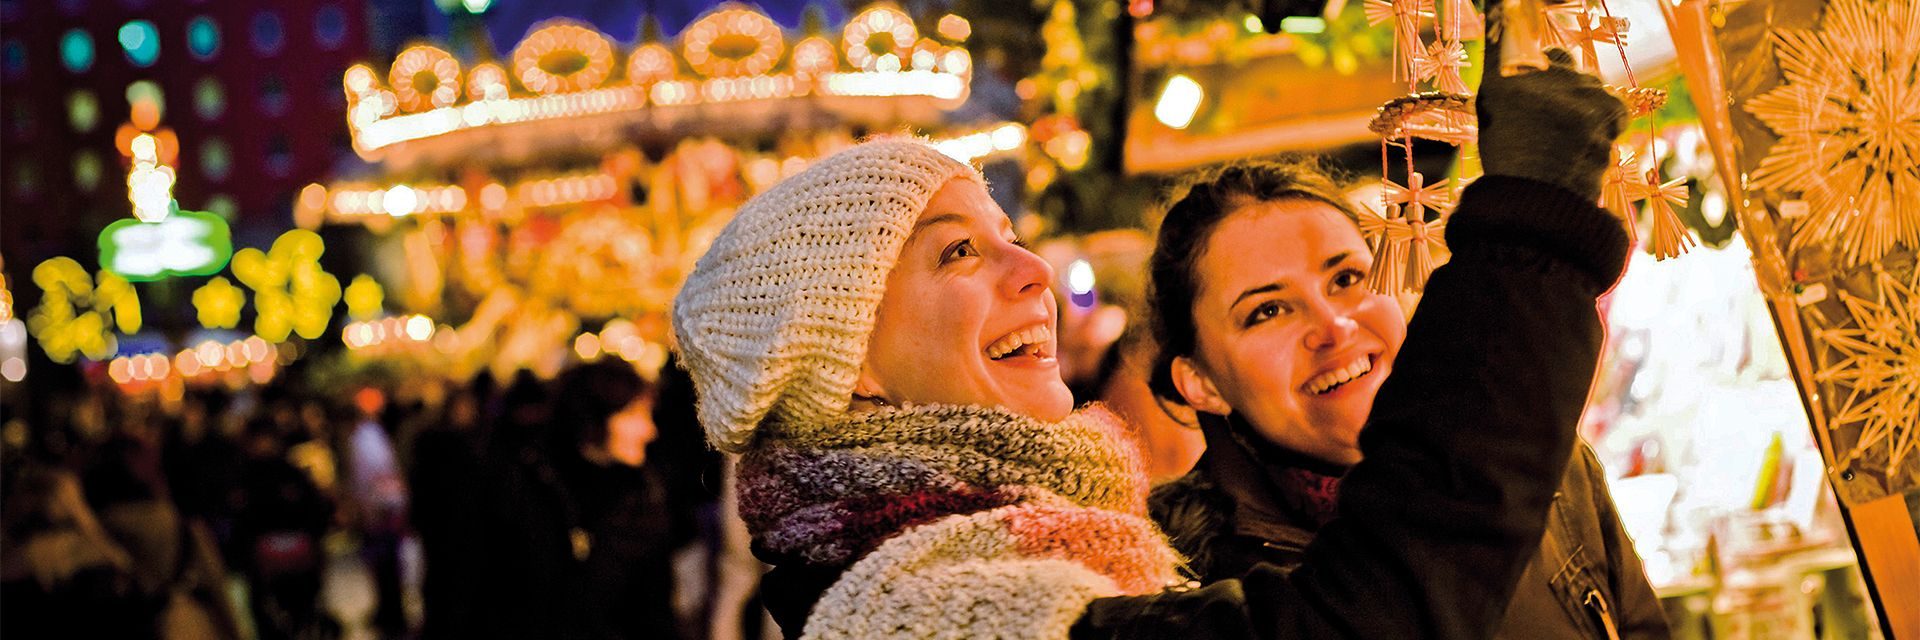 julmarknad i hildesheim